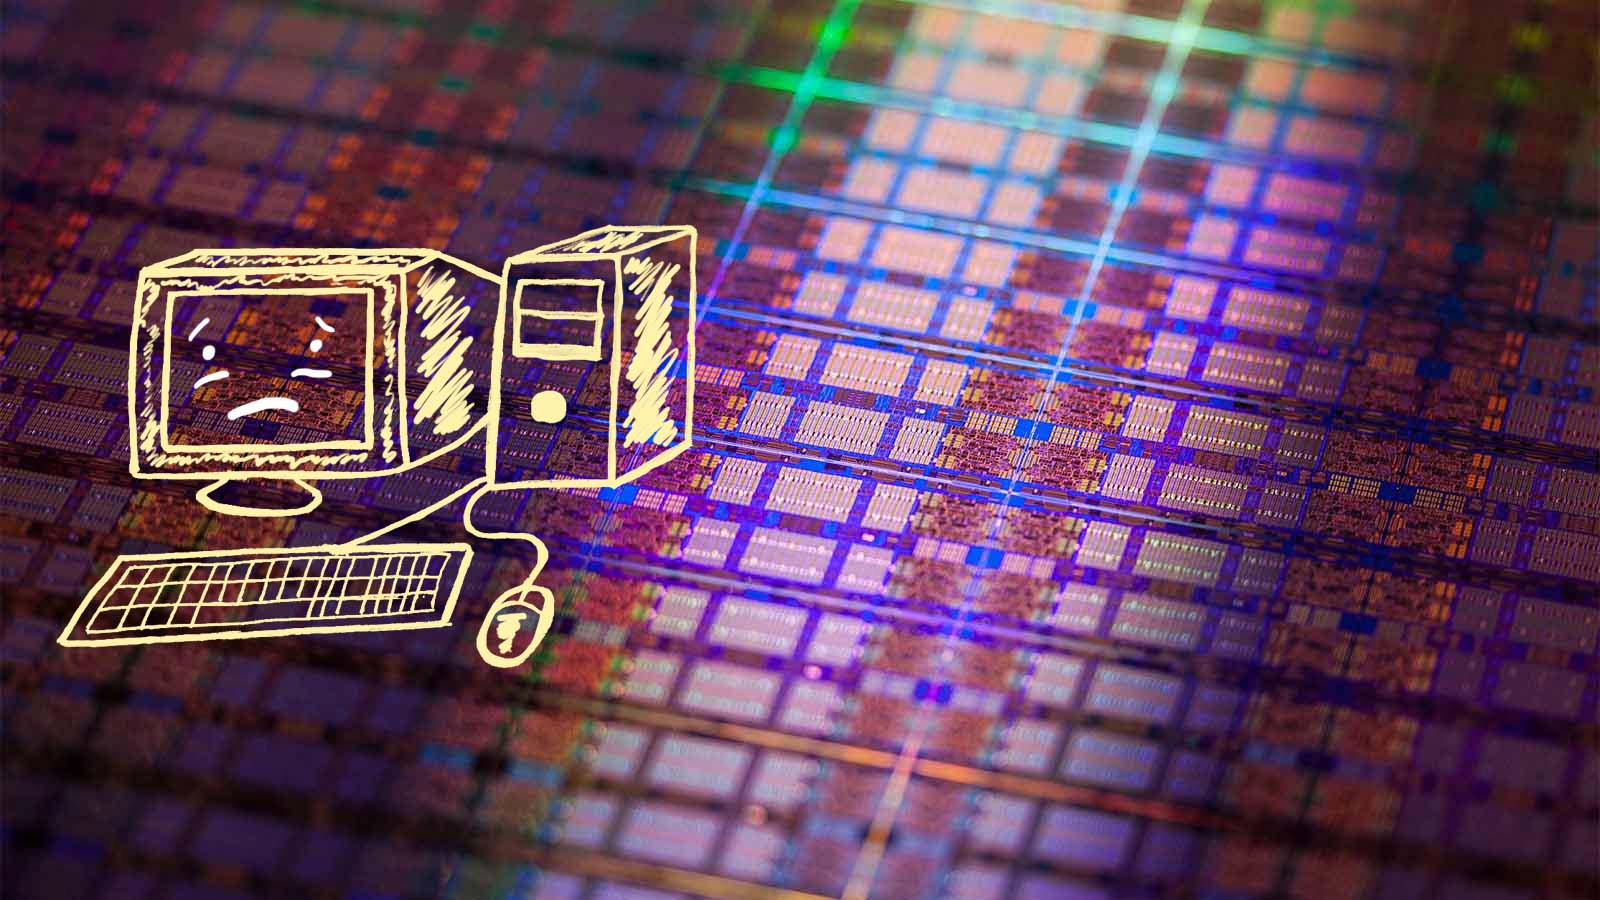 procesor tranzystor